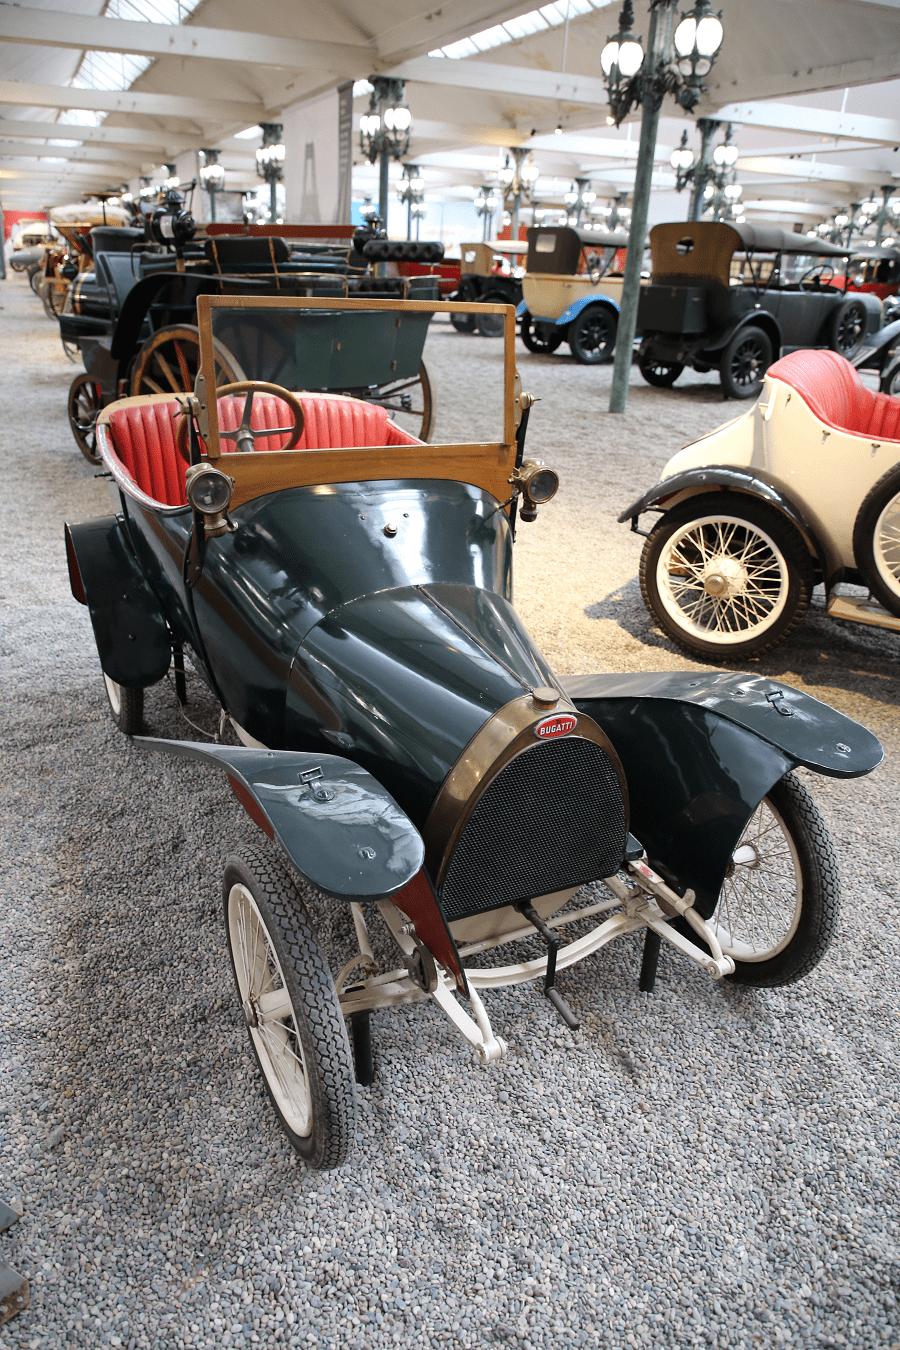 Bugatti Torpedo Type 19 Bébé. Сделано во Франции